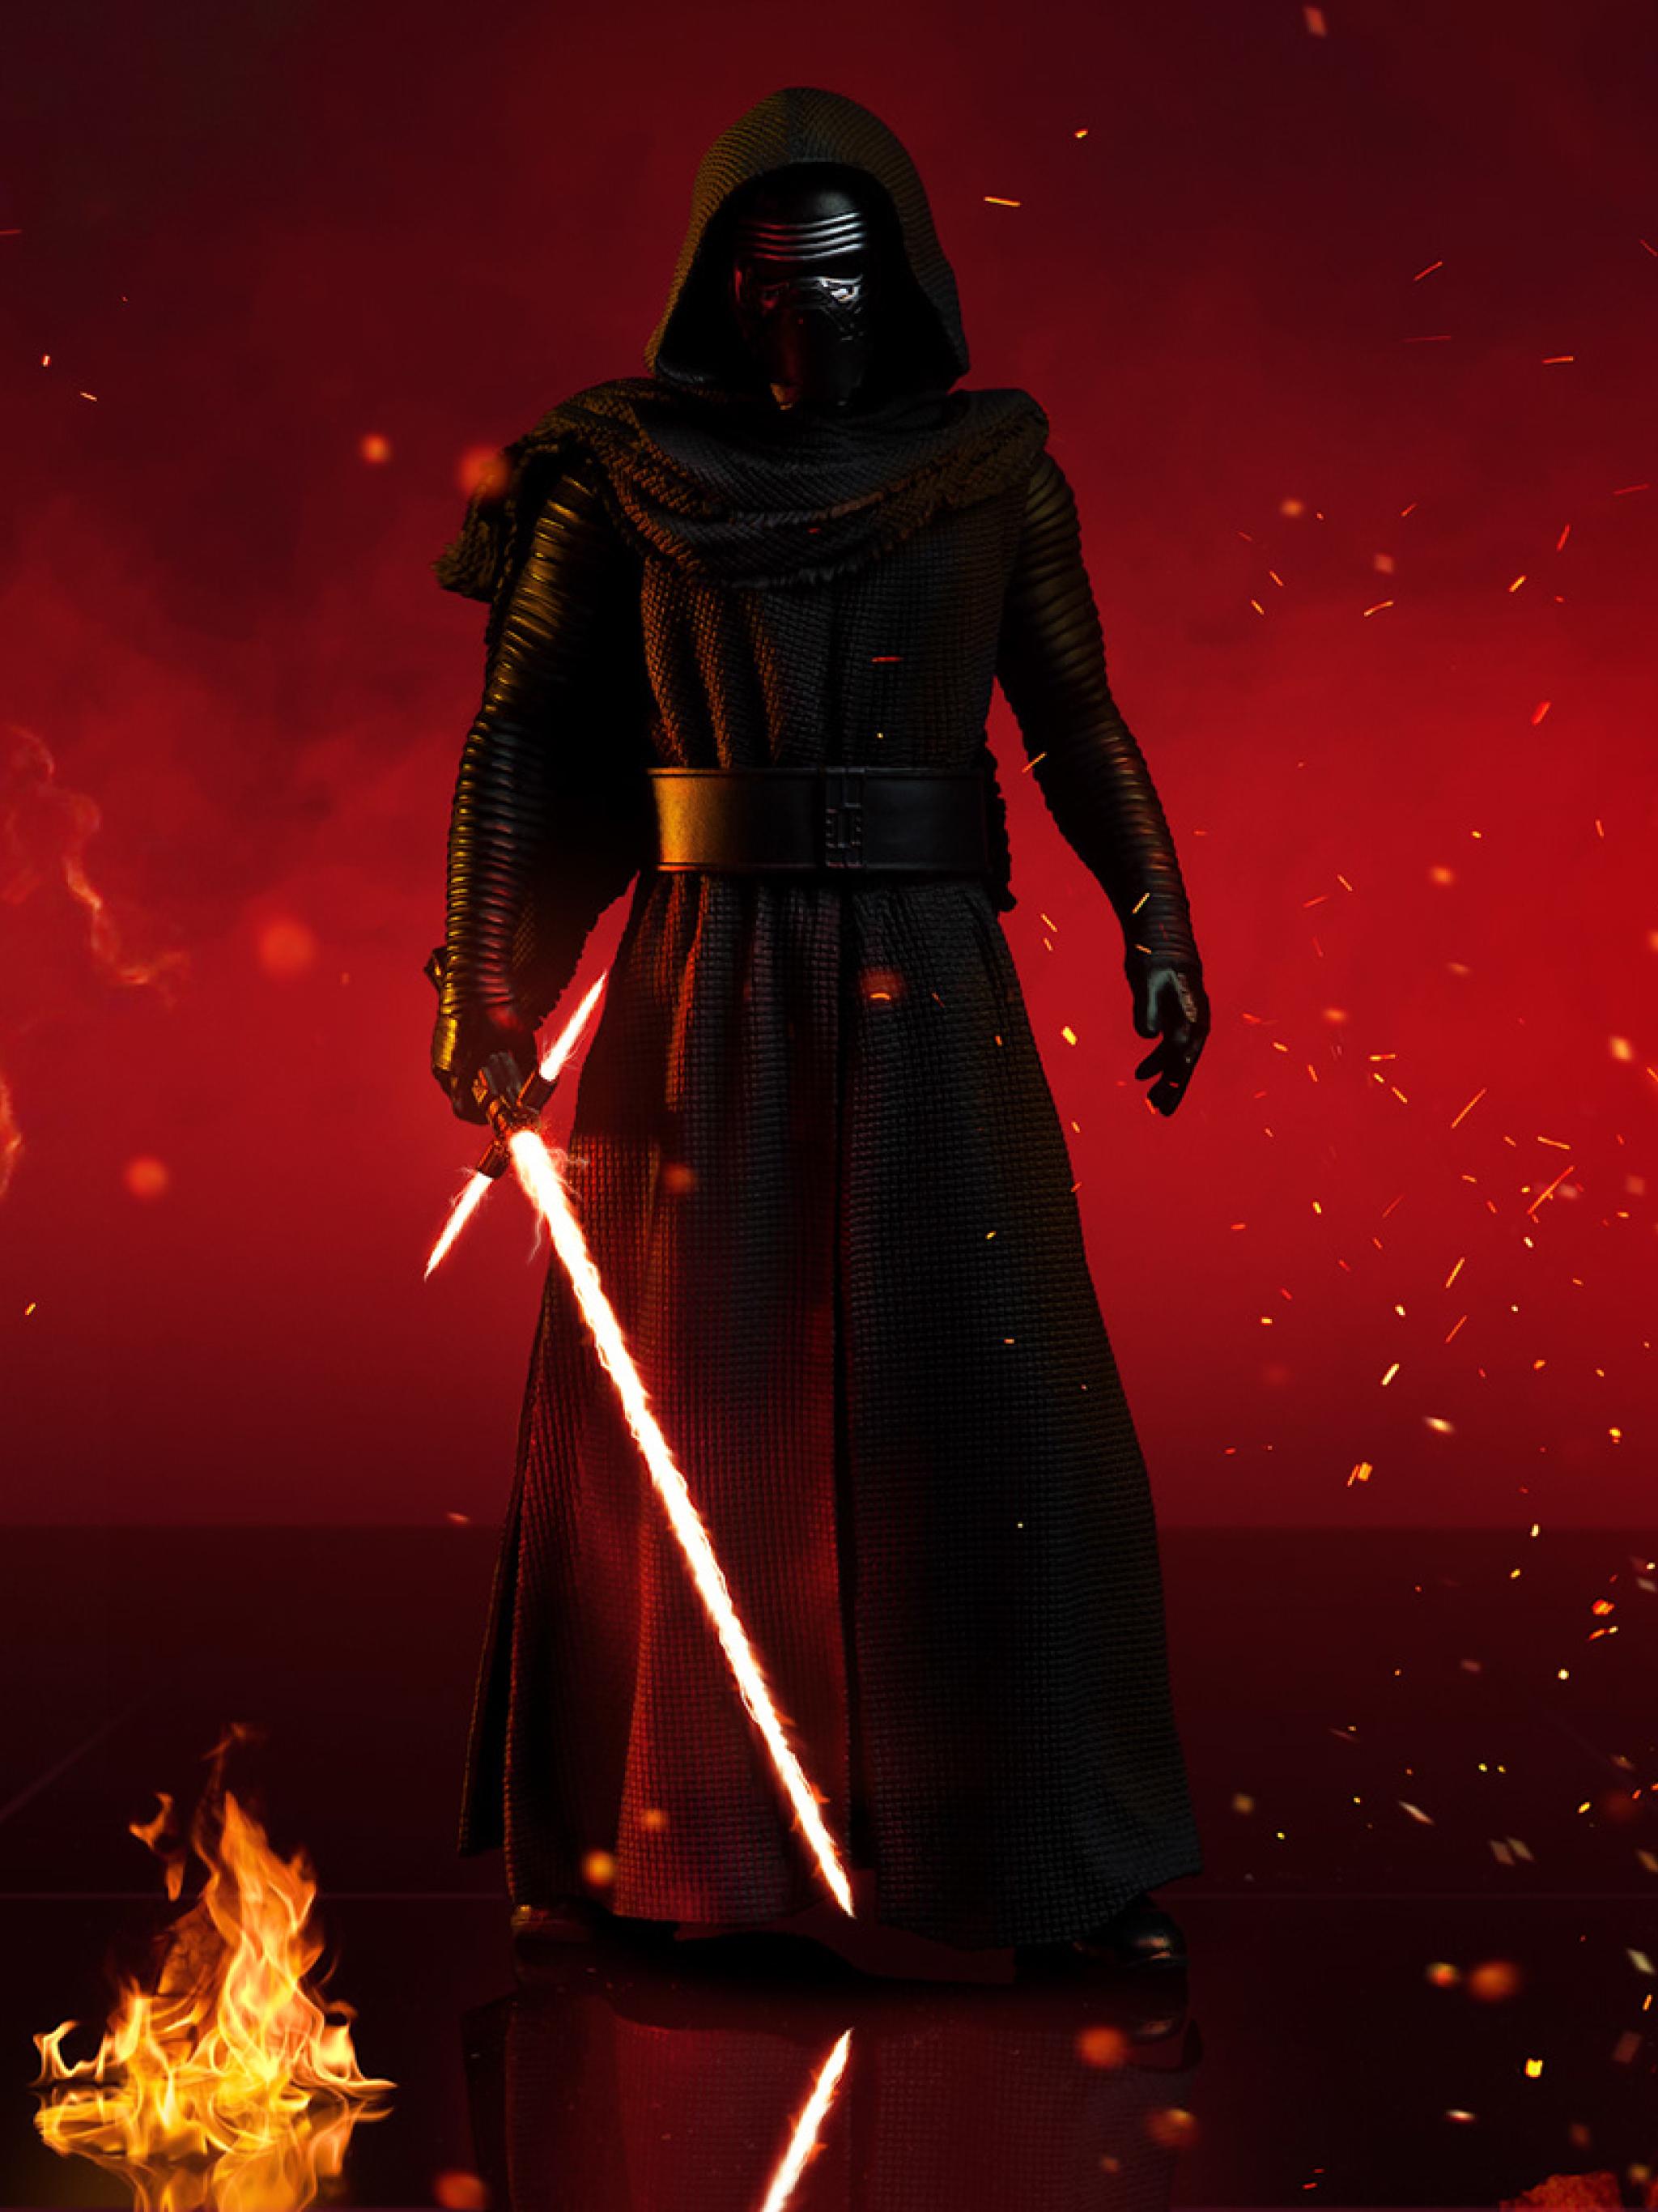 2048x2732 Kylo Ren With Lightsaber In Star Wars 2048x2732